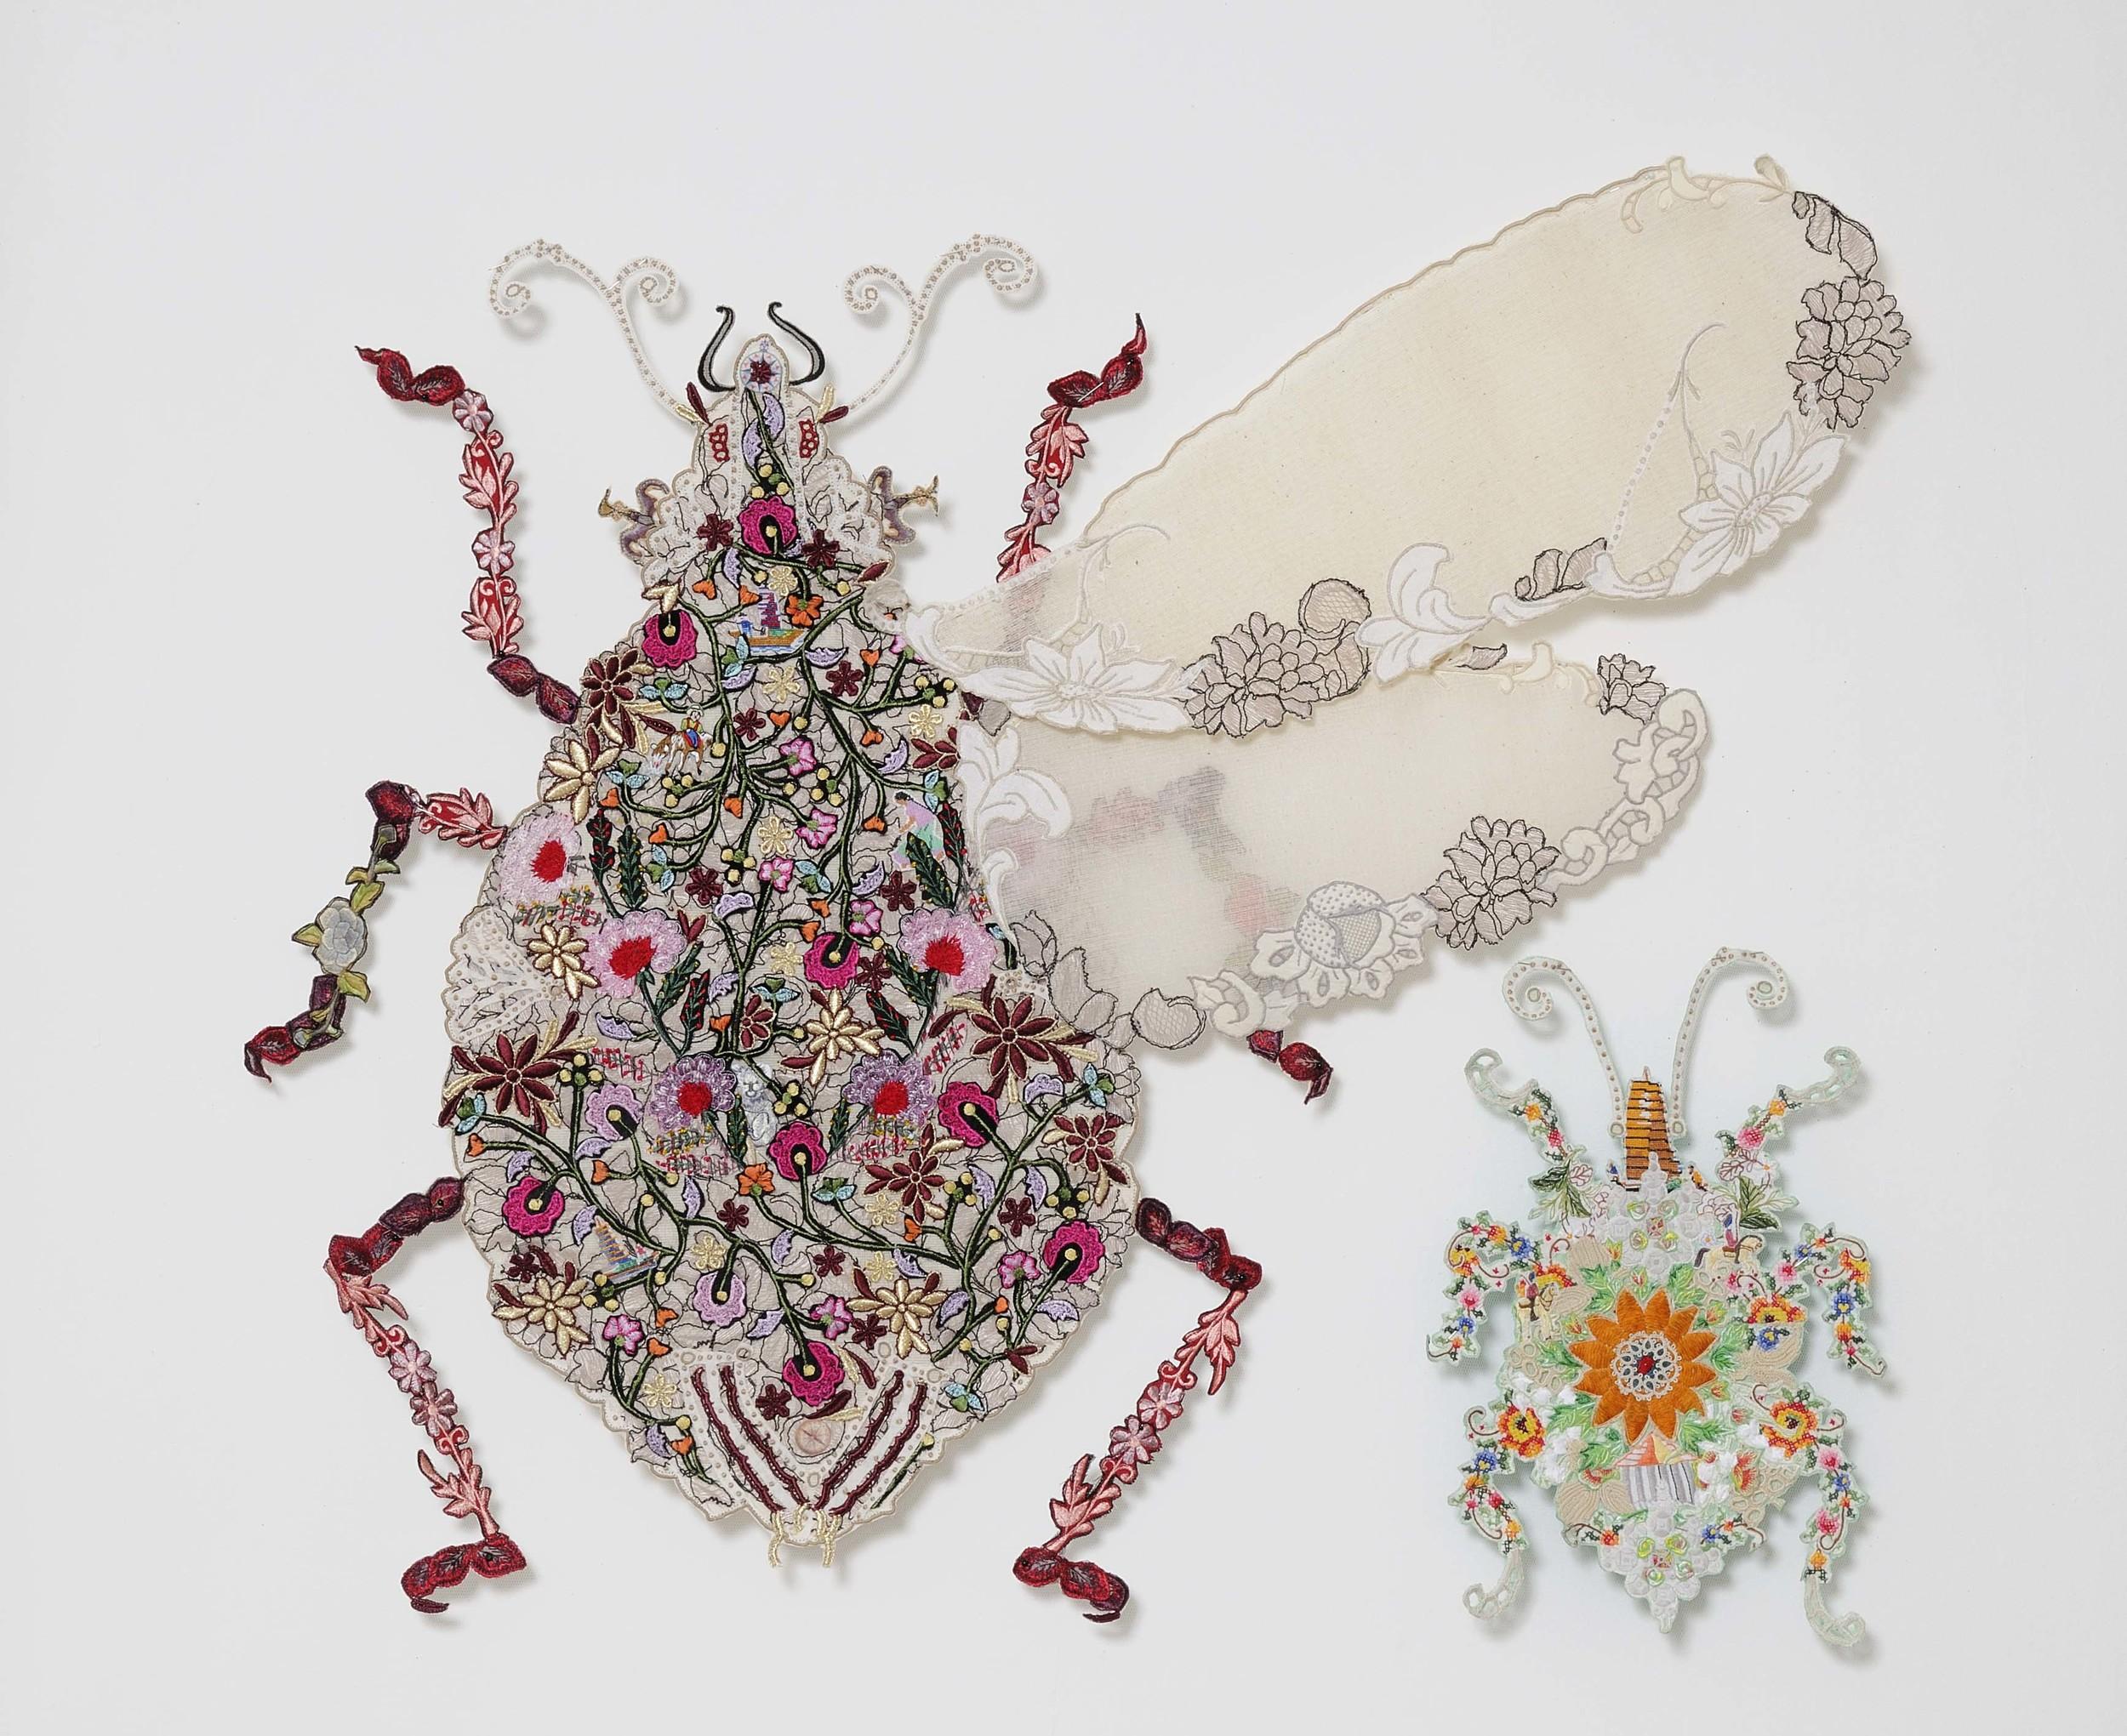 Copy of Travel Bugs 2009 (Aviatus hemipterai & Aviatus maladeus hemipterai)